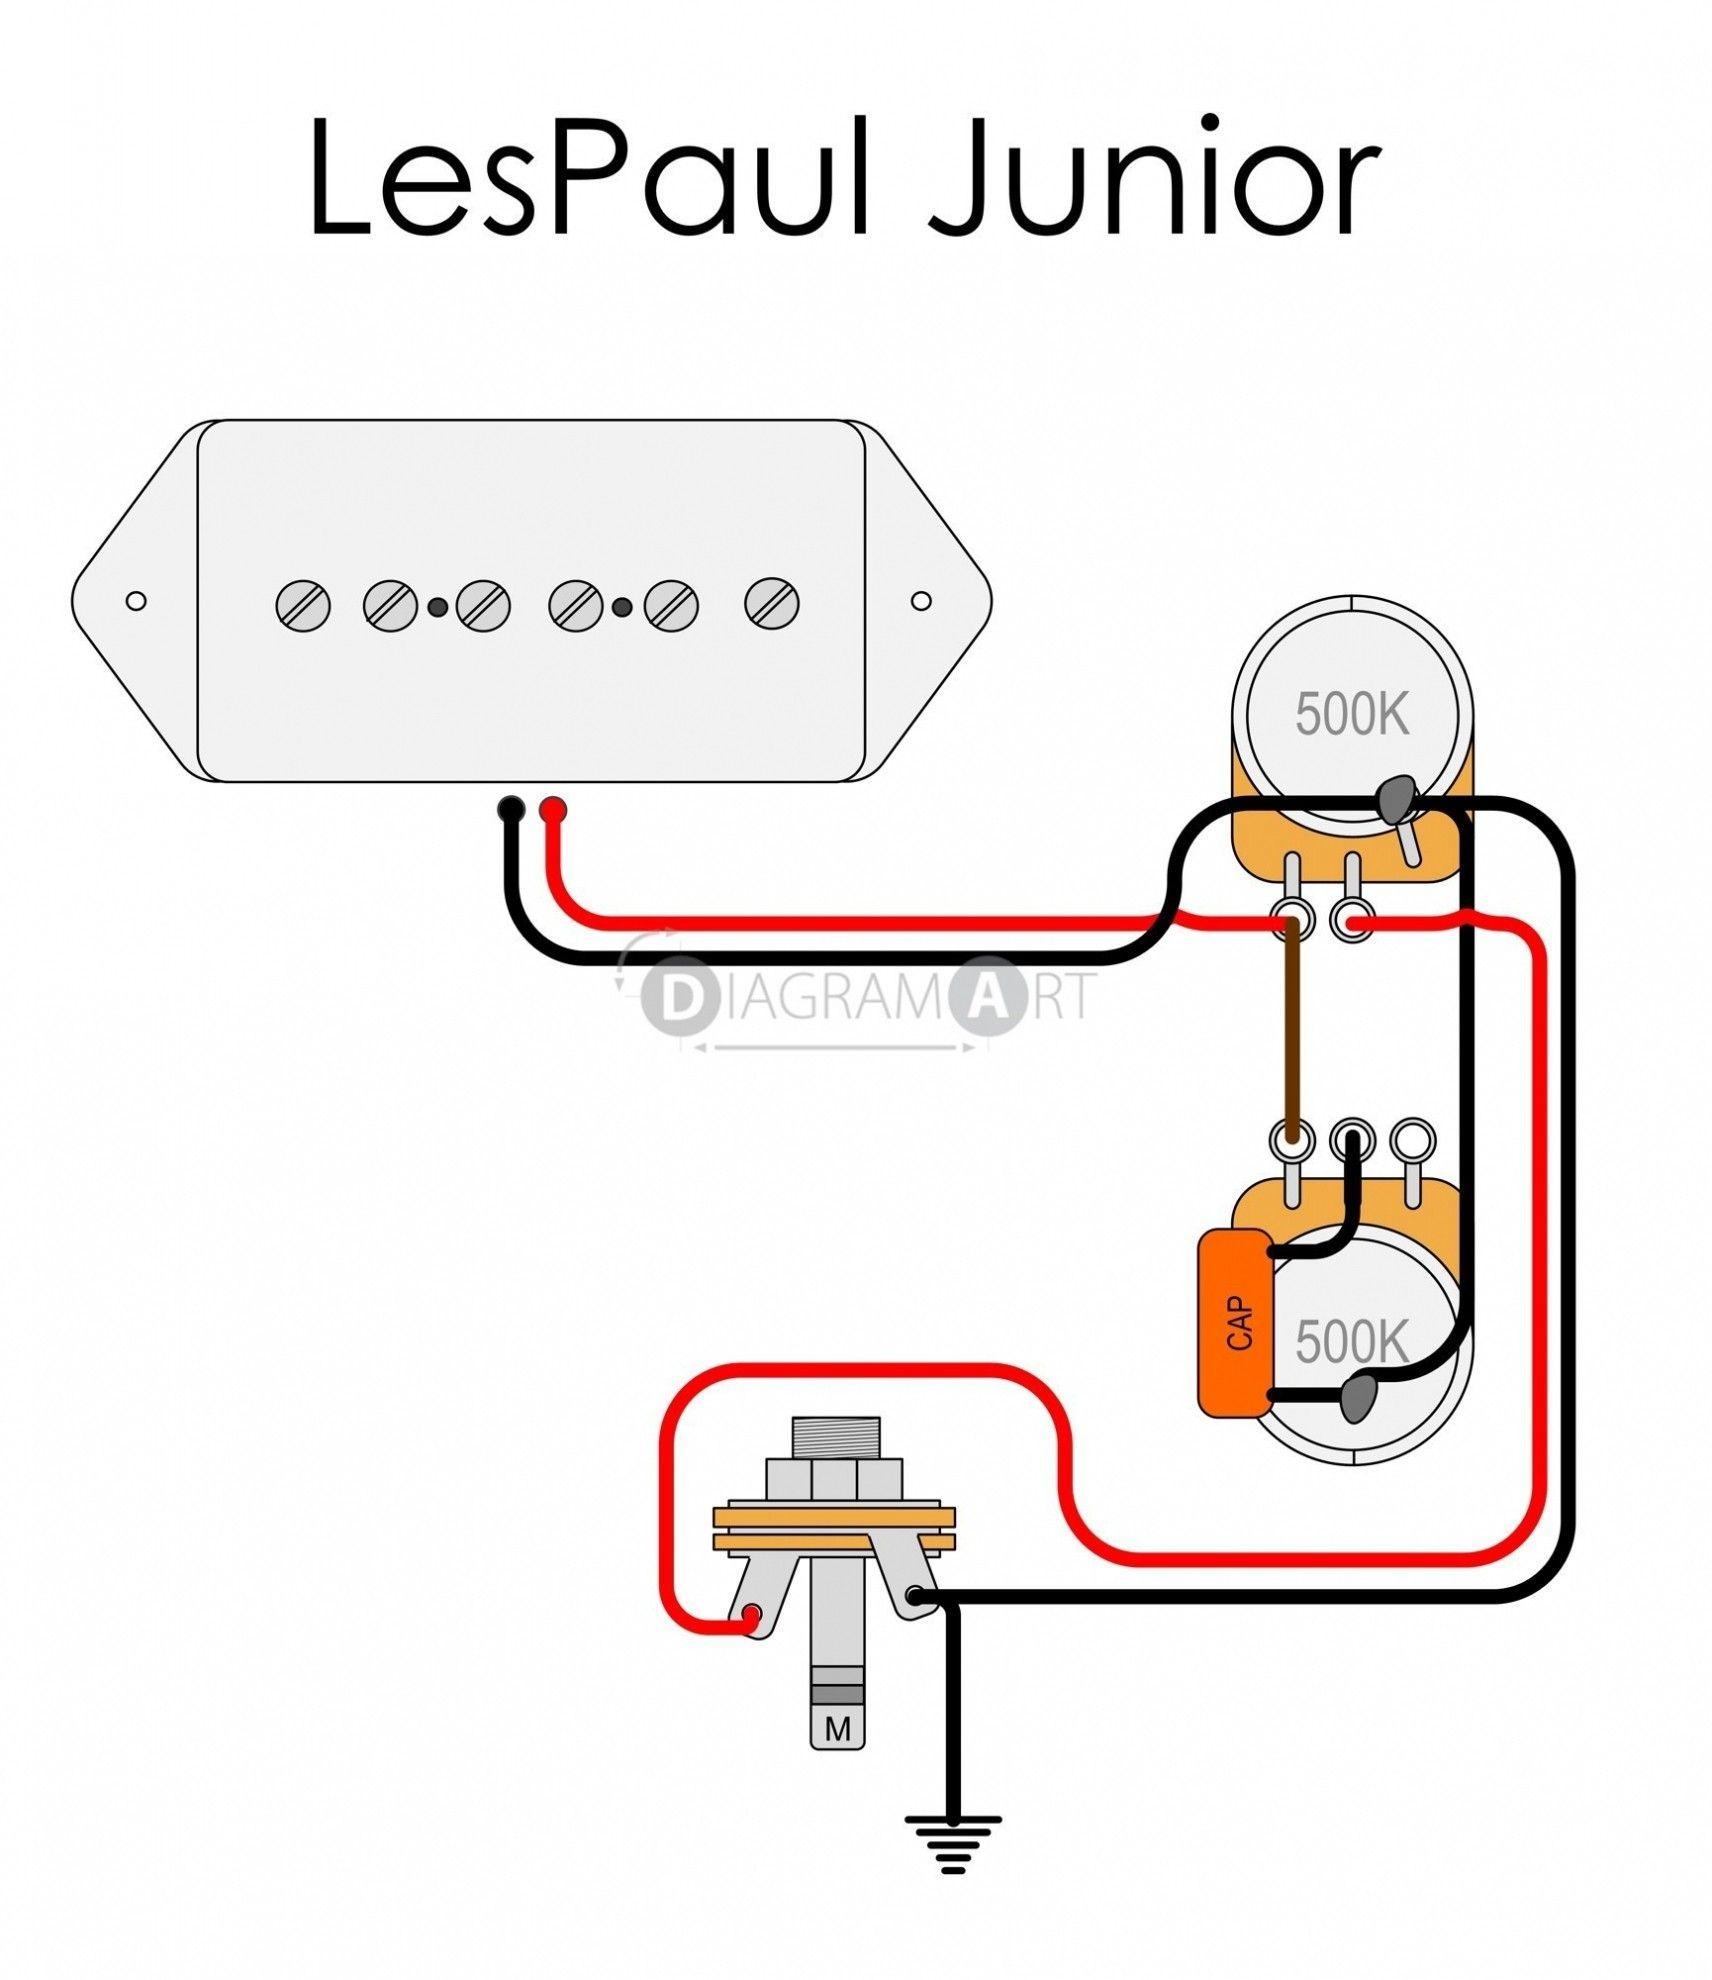 Unique Wiring Diagram For One Pickup Guitar Diagram Diagramsample Diagramtemplate Wiringdiagram Diagramchart Workshee Epiphone Les Paul Les Paul Epiphone